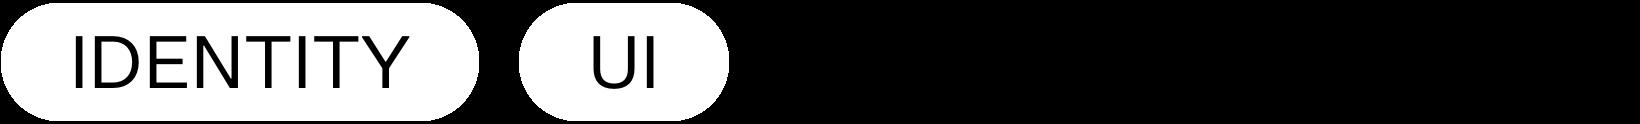 marcostoermer-namiki-tags